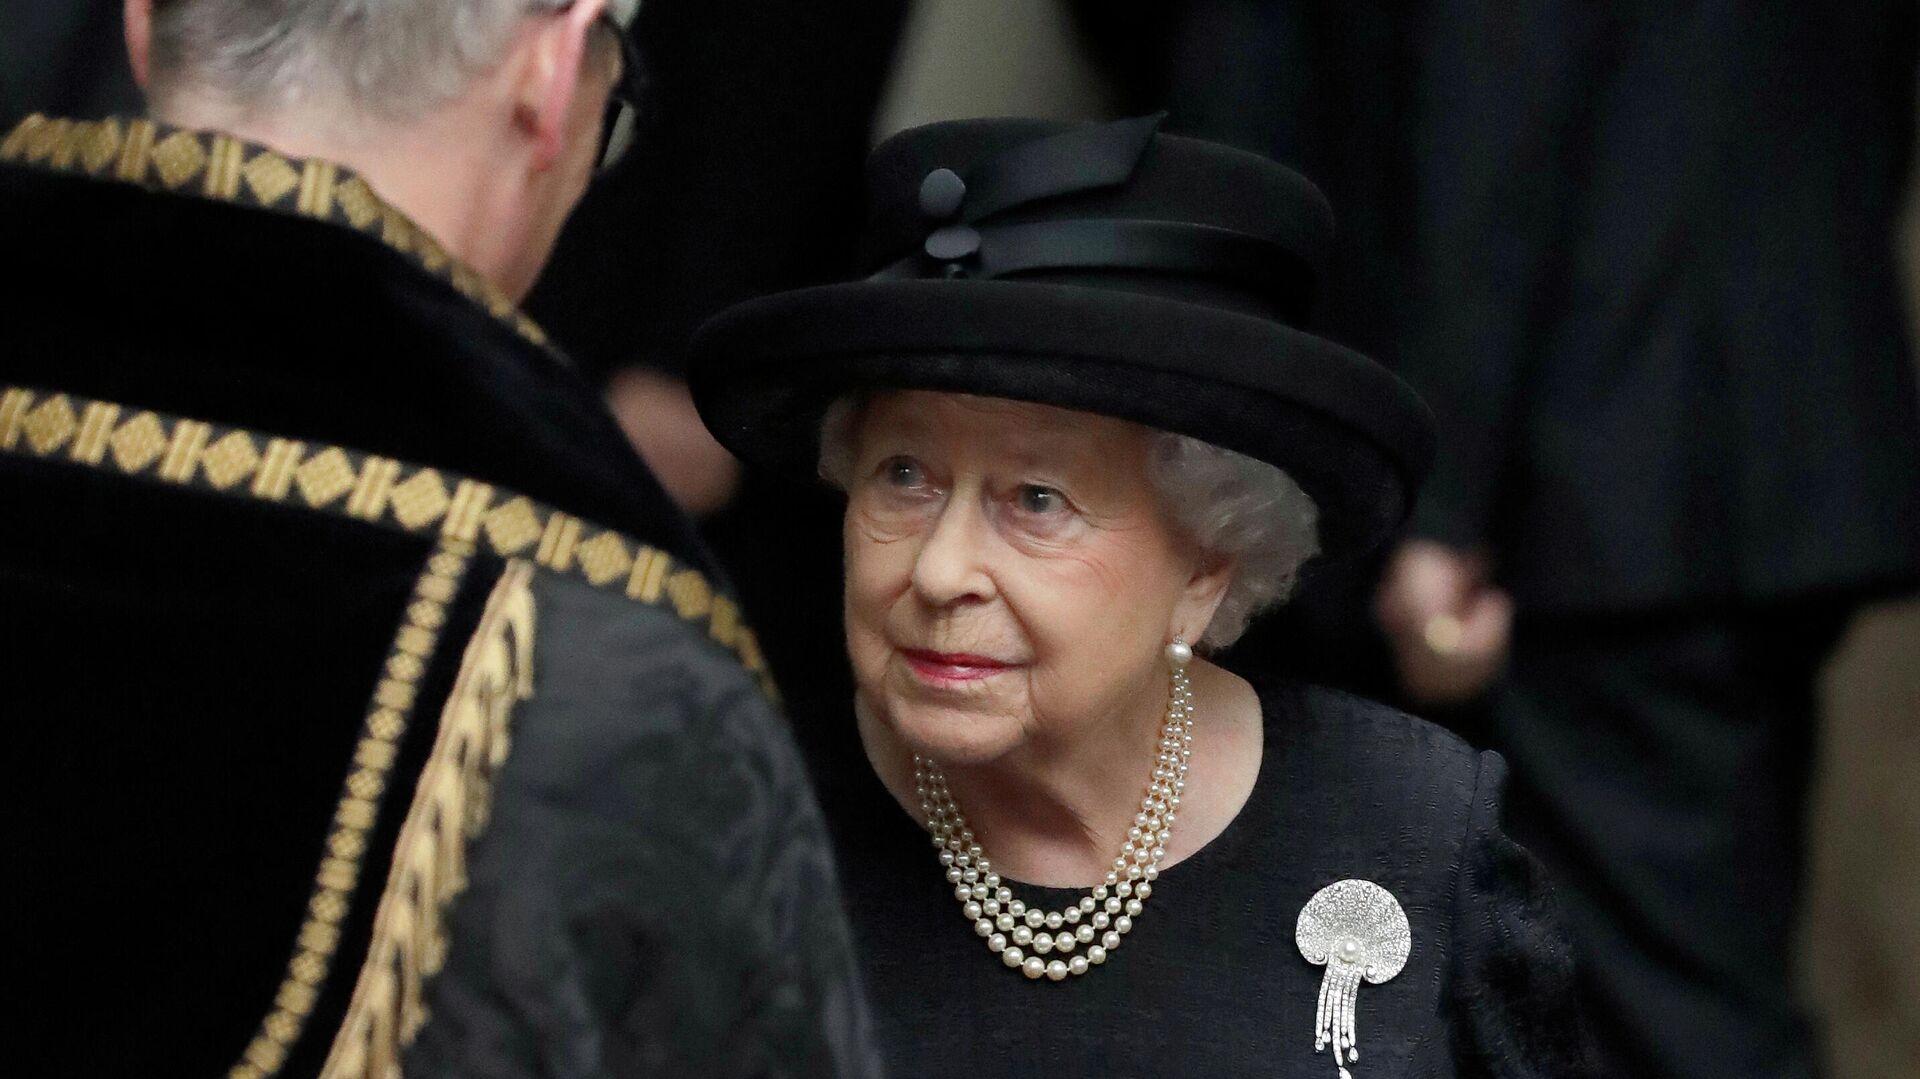 La reina Isabel II, foto de archivo - Sputnik Mundo, 1920, 11.04.2021